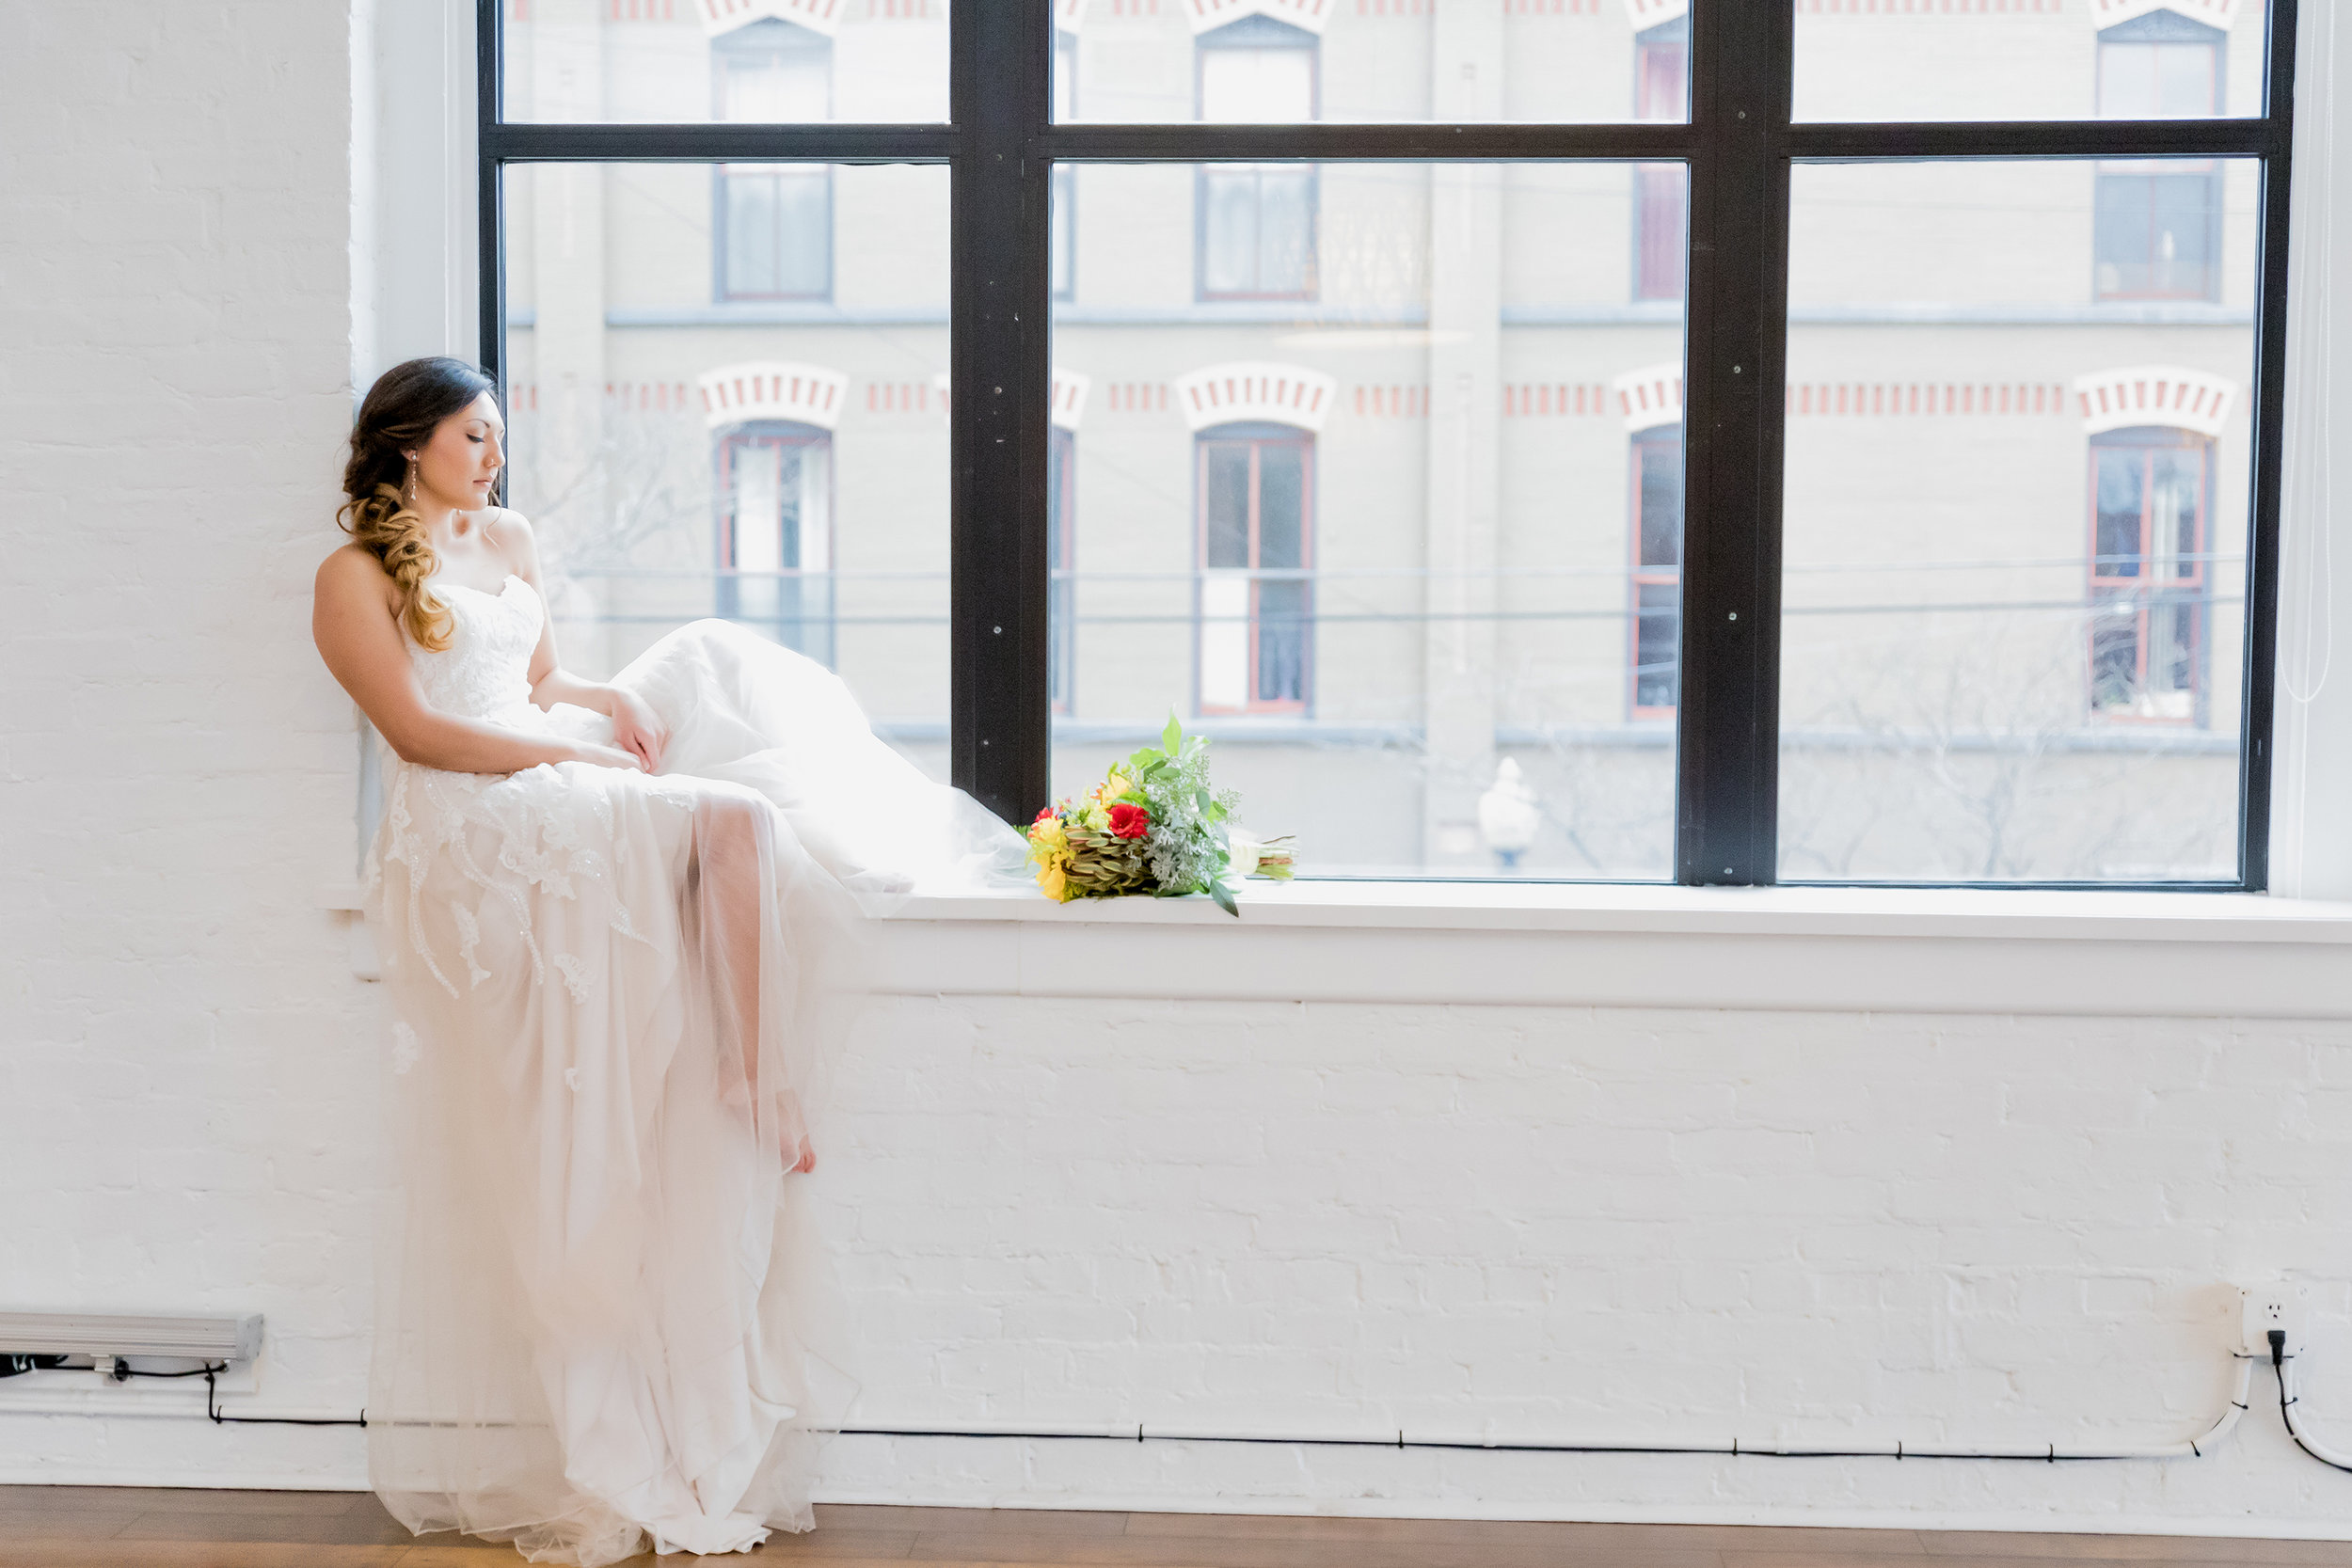 Memories – Michigan's Own Bridal Shop, Pageant